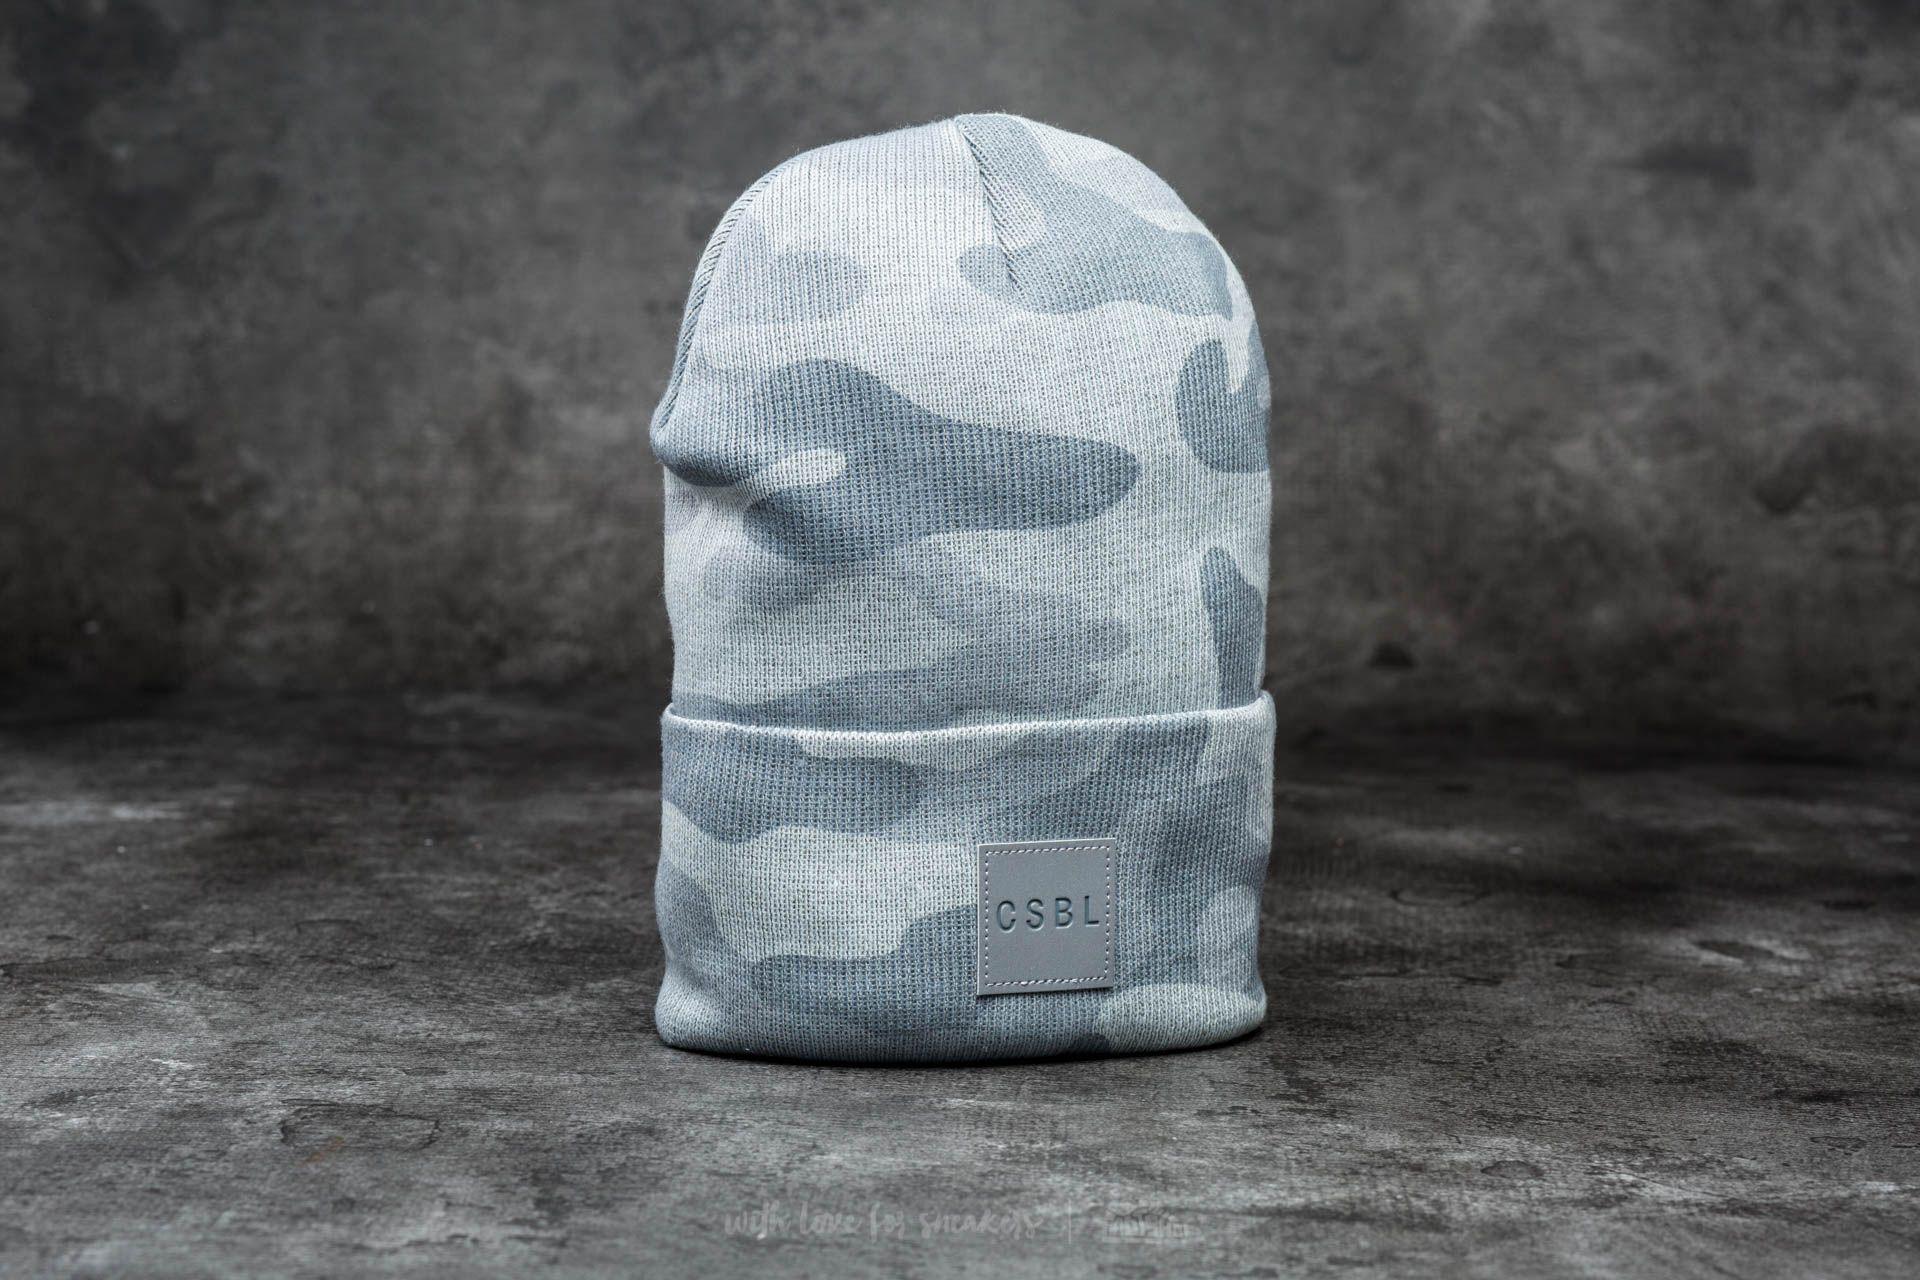 Cayler & Sons CSBL Millennivm Beanie Stone Camo/ Reflective Grey - 12499